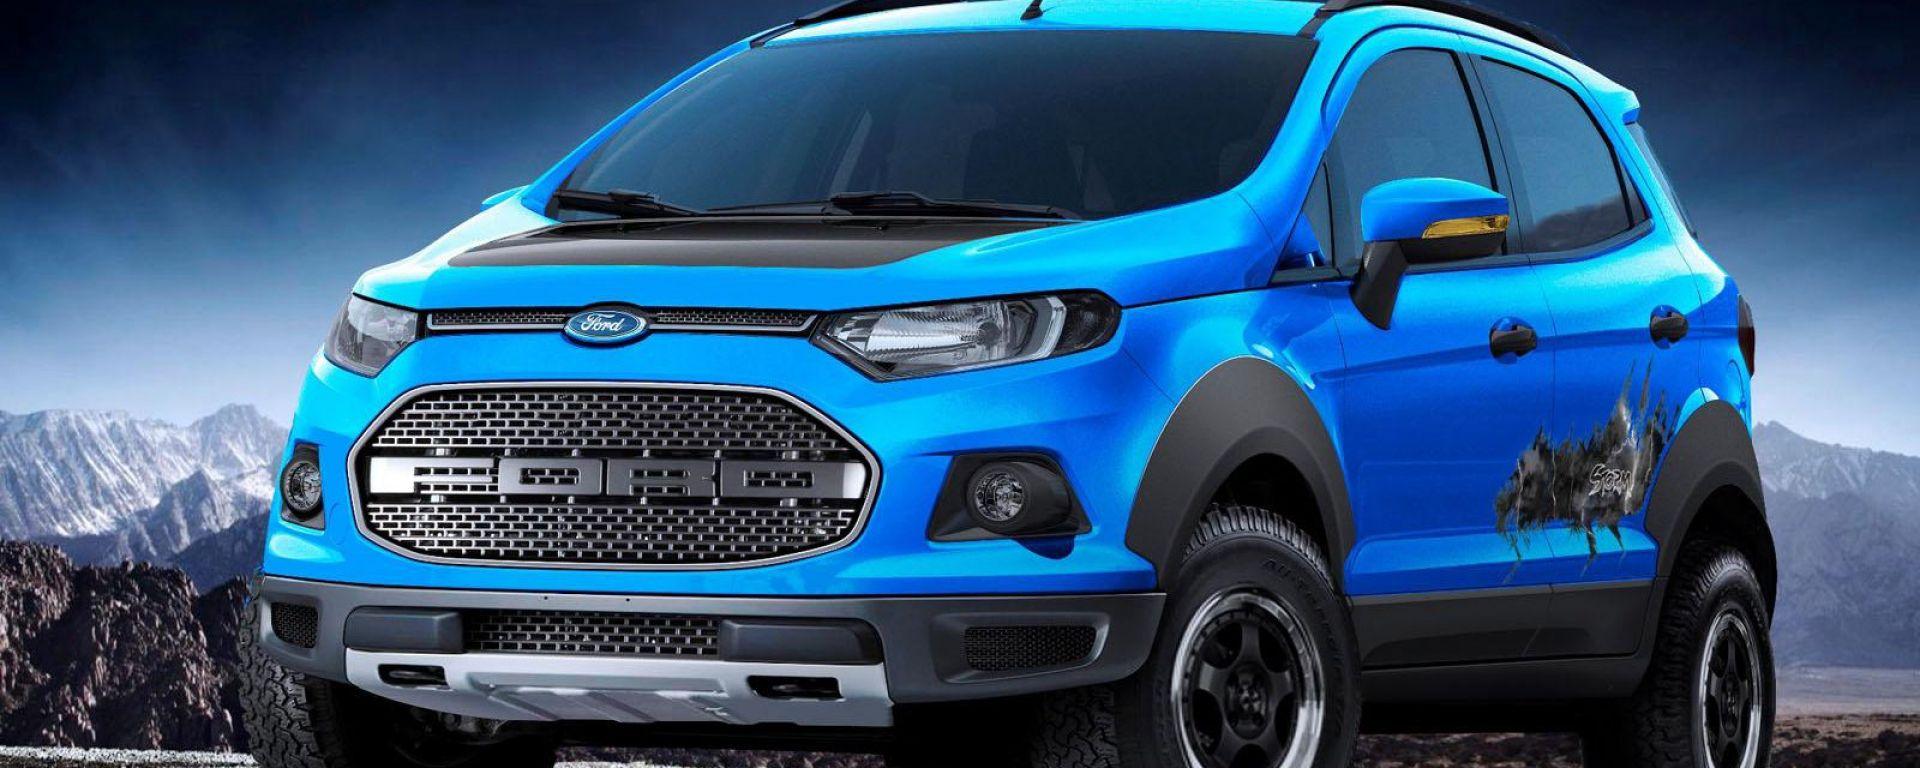 Ford EcoSport, variazioni sul tema